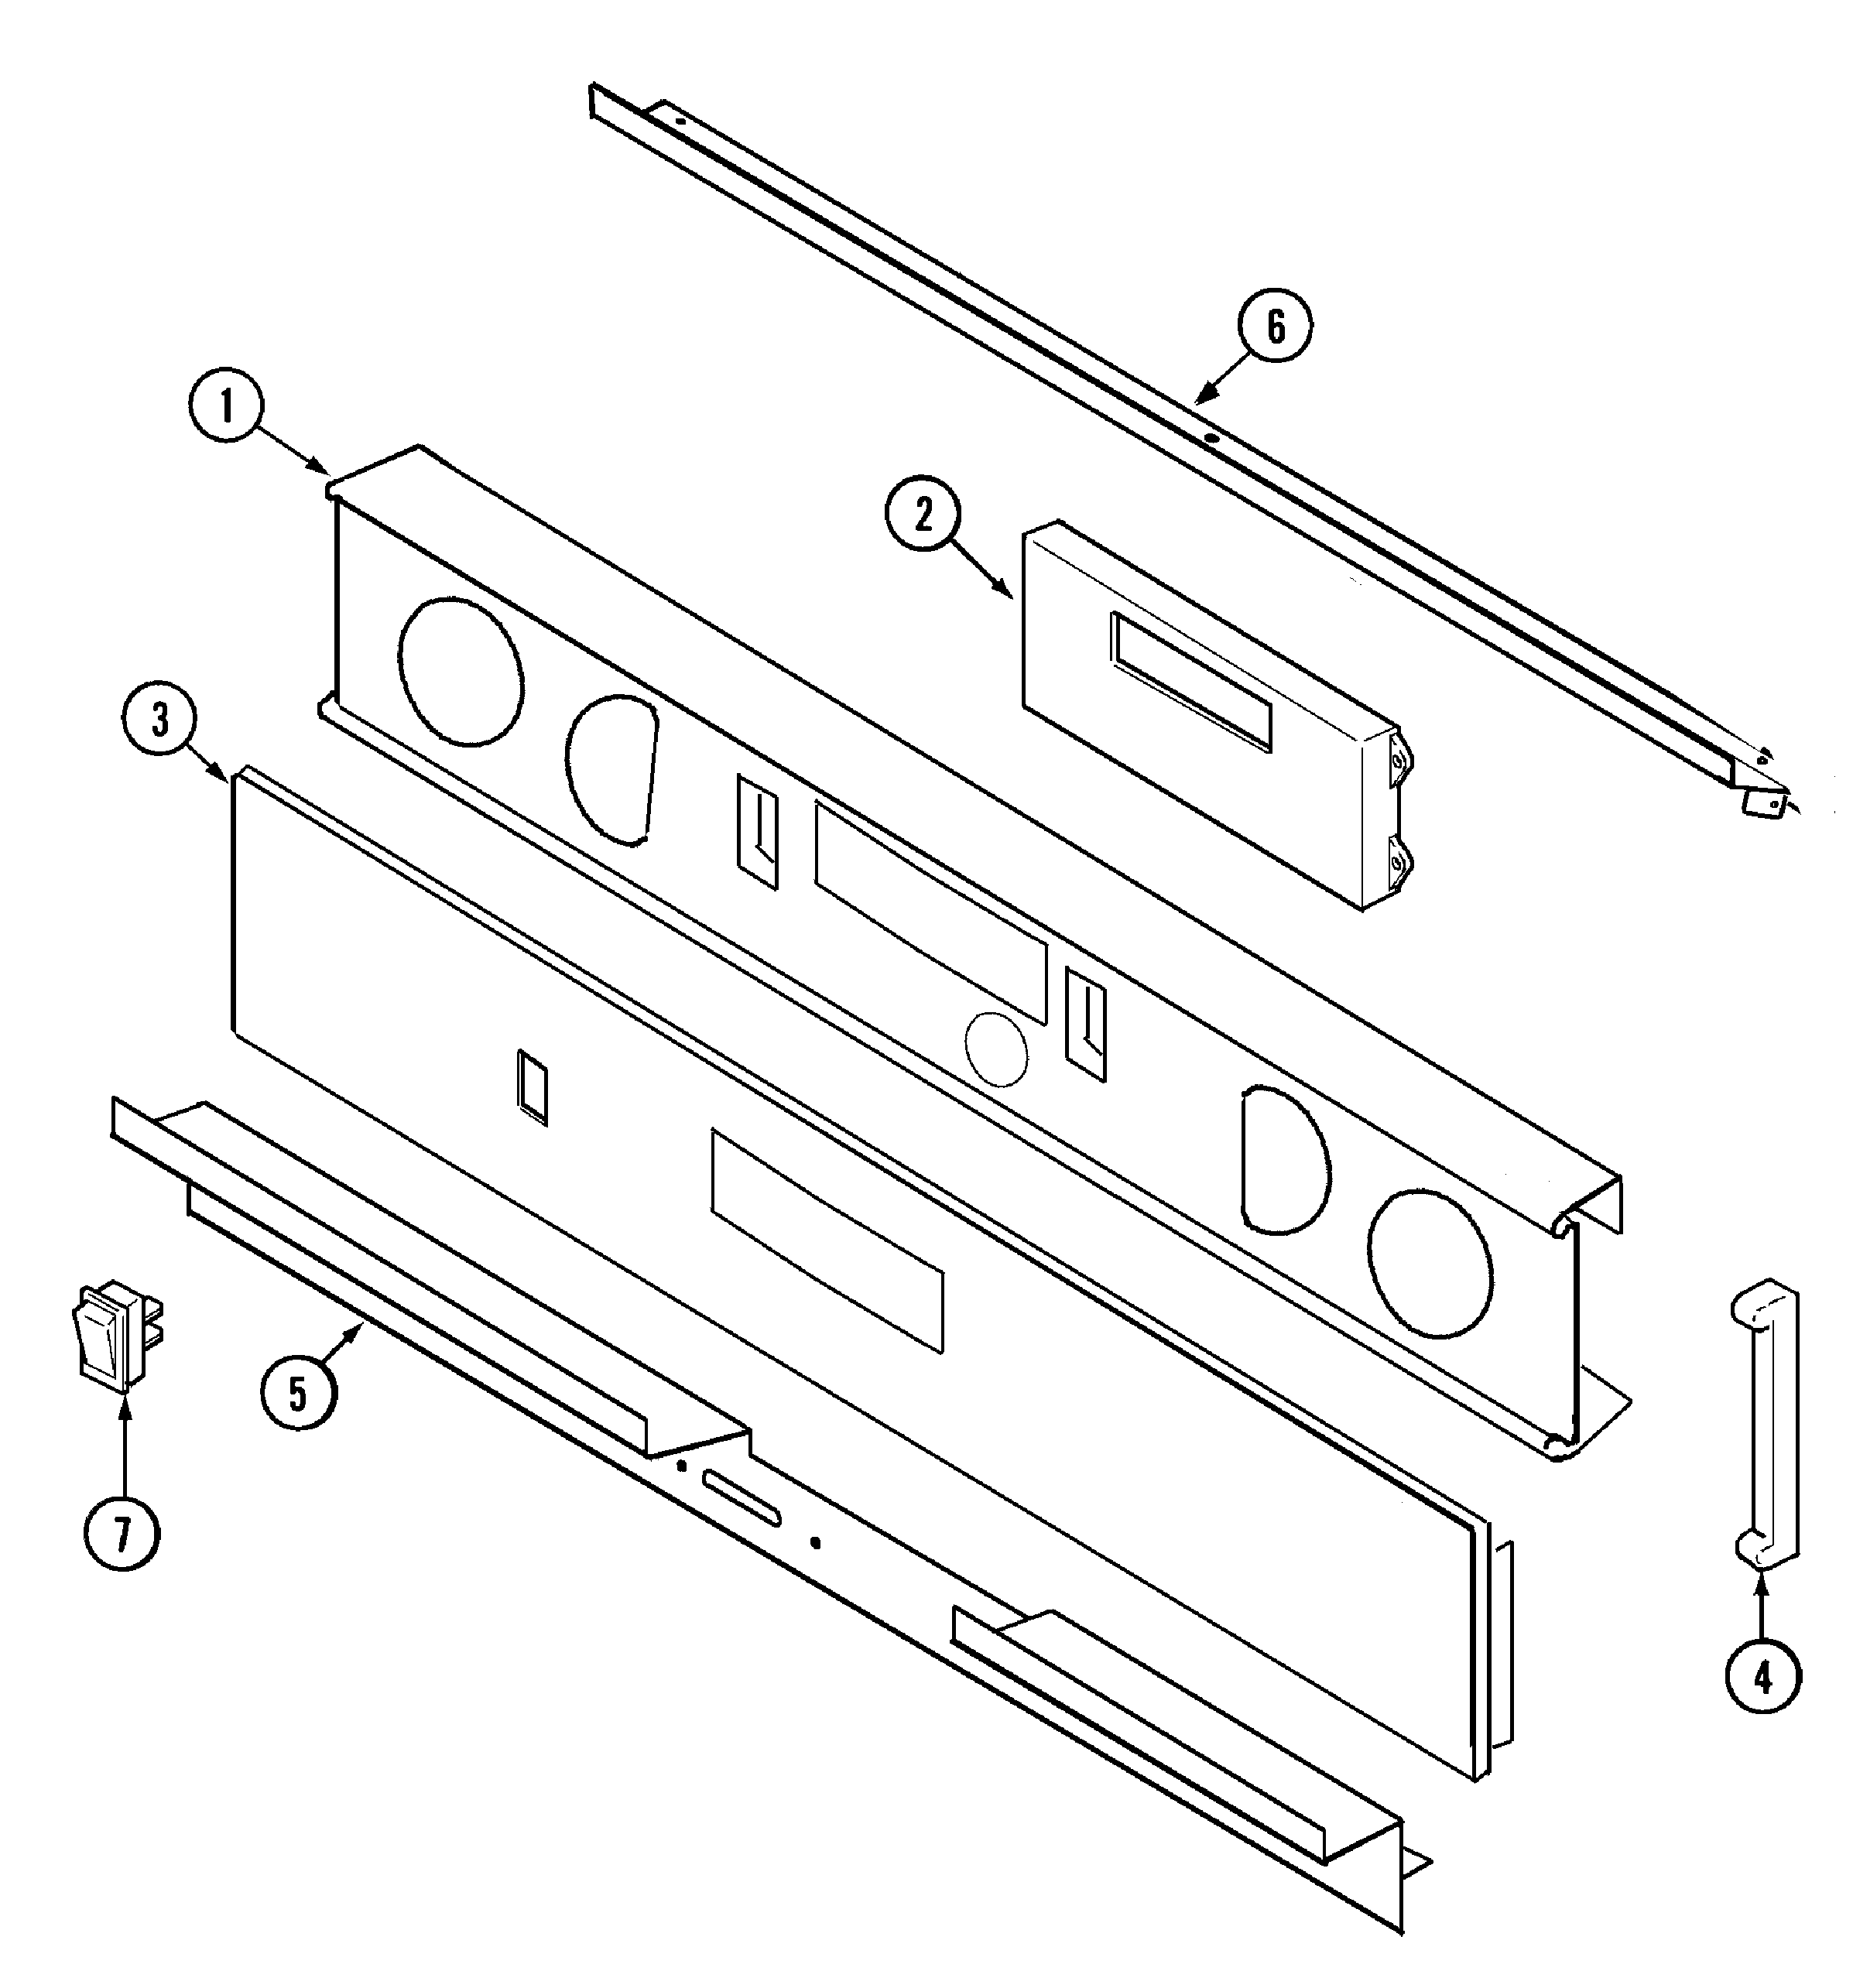 Maytag Wall Oven Wiring Diagram - Wiring Diagram G11